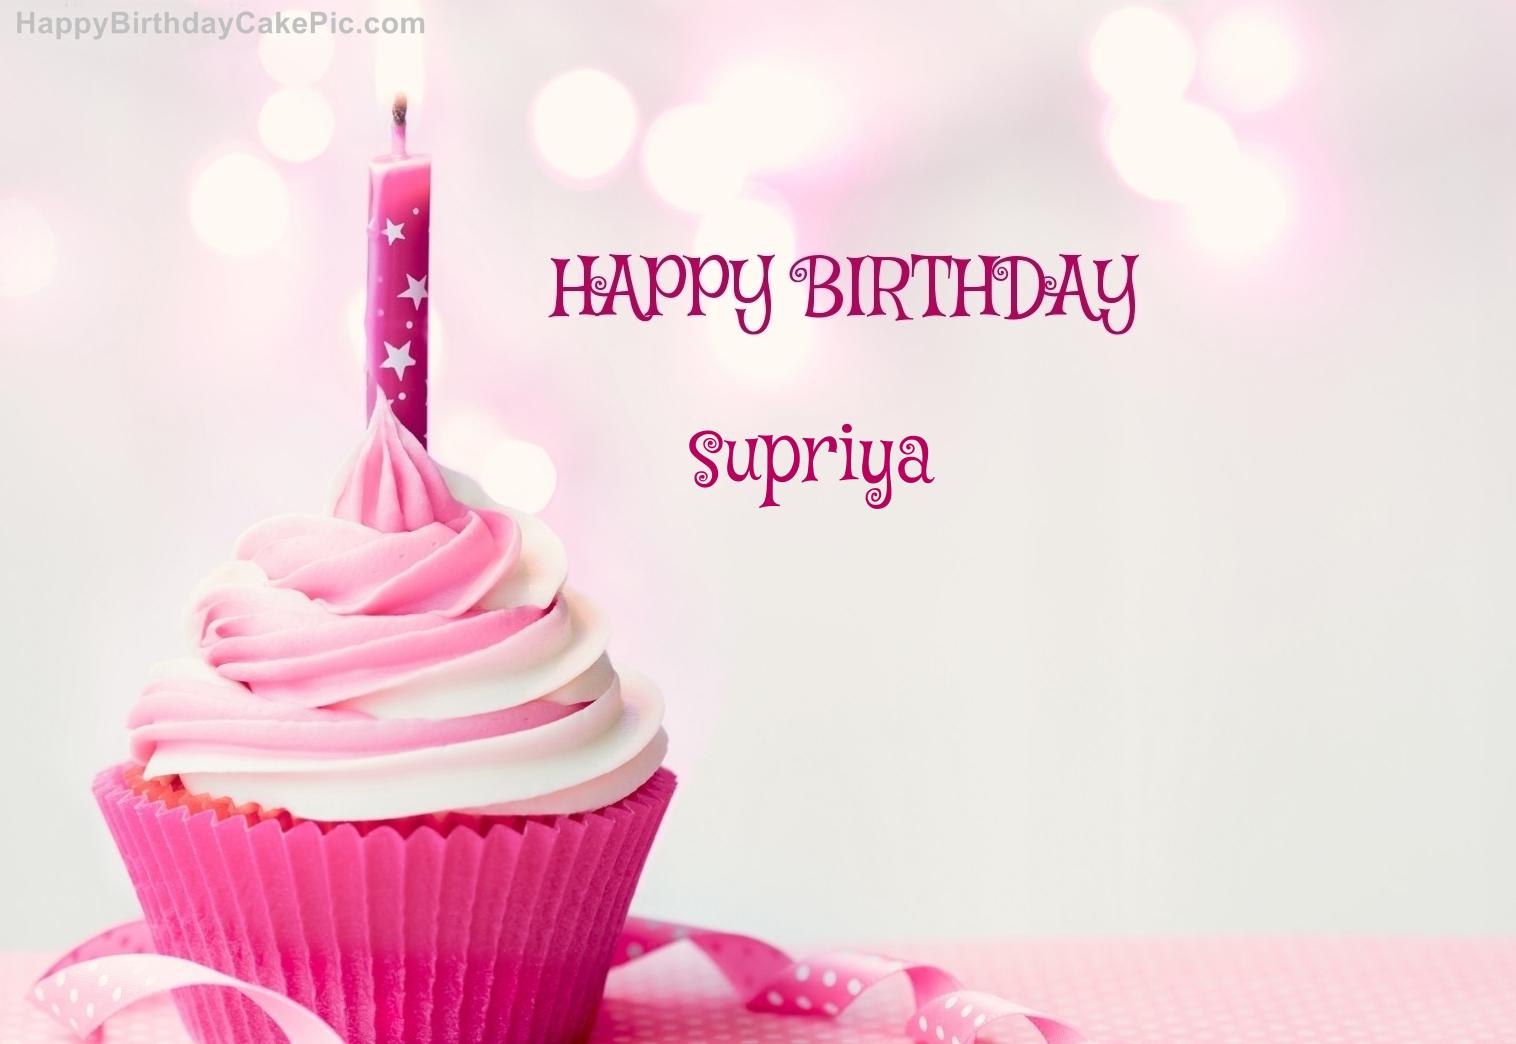 Birthday Cakes With Name Sachin ~ Happy birthday cupcake candle pink cake for supriya